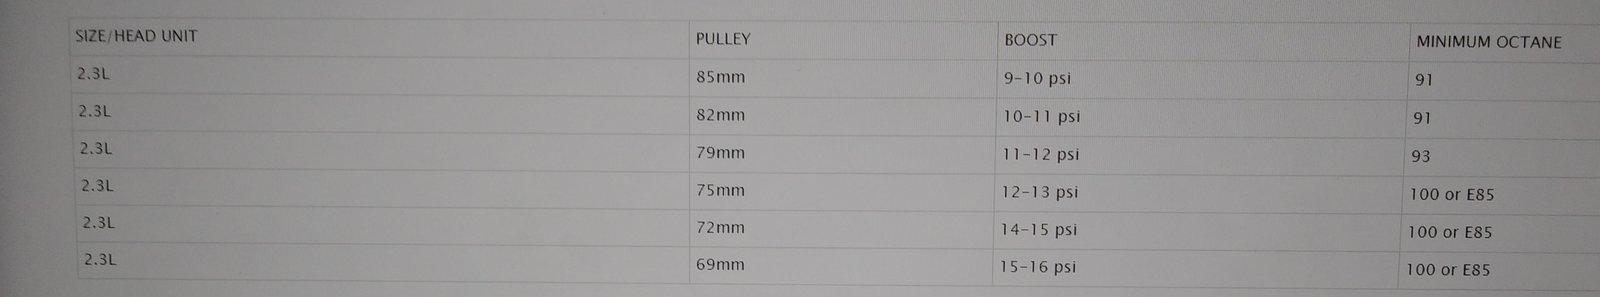 pulley-octane.jpg